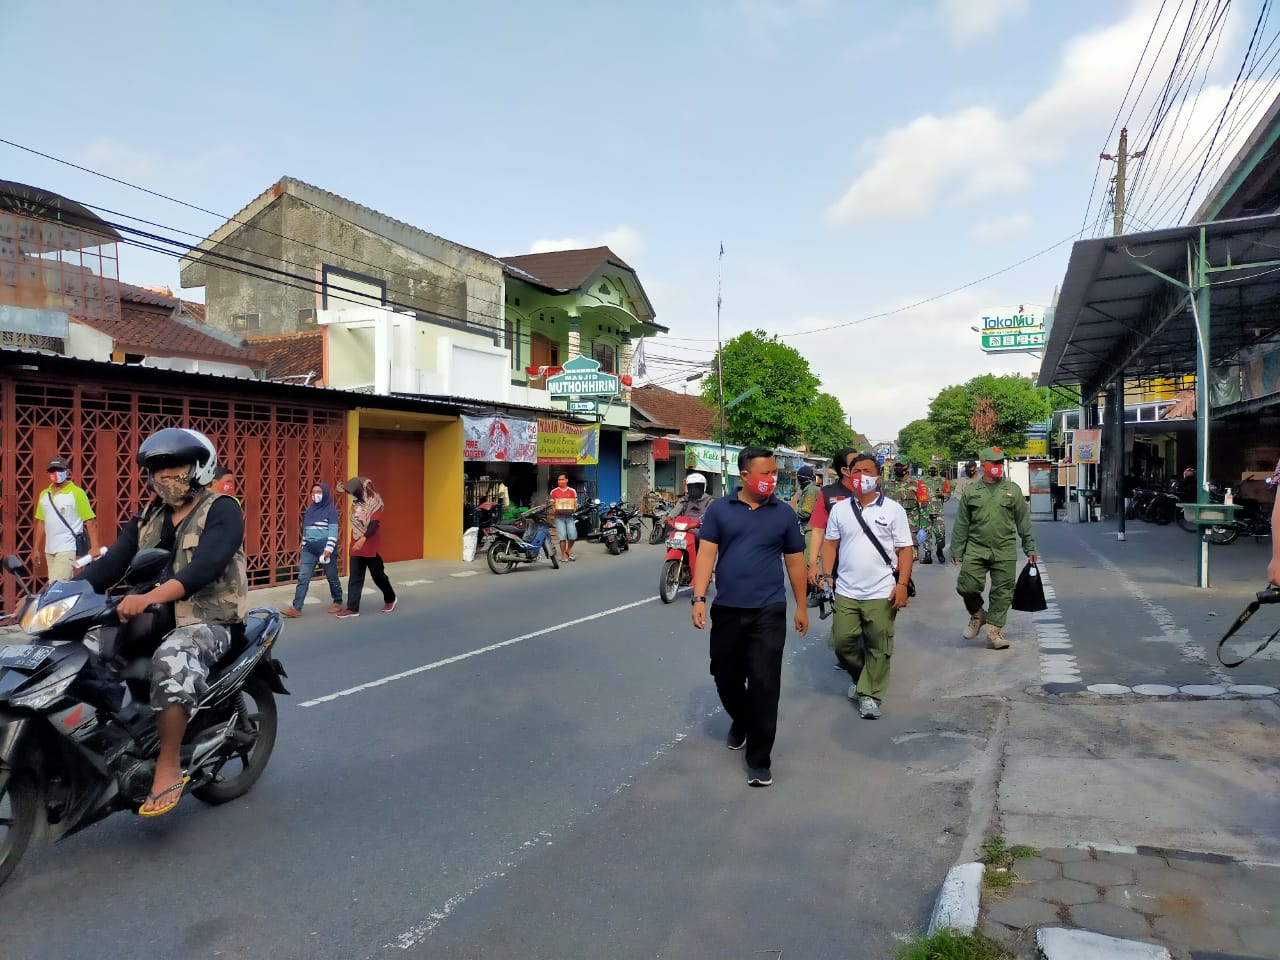 Edukasi kembali Pelaksanaan Protokol Kesehatan bagi Pelaku Usaha dan Masyarakat Kelurahan Sorosutan